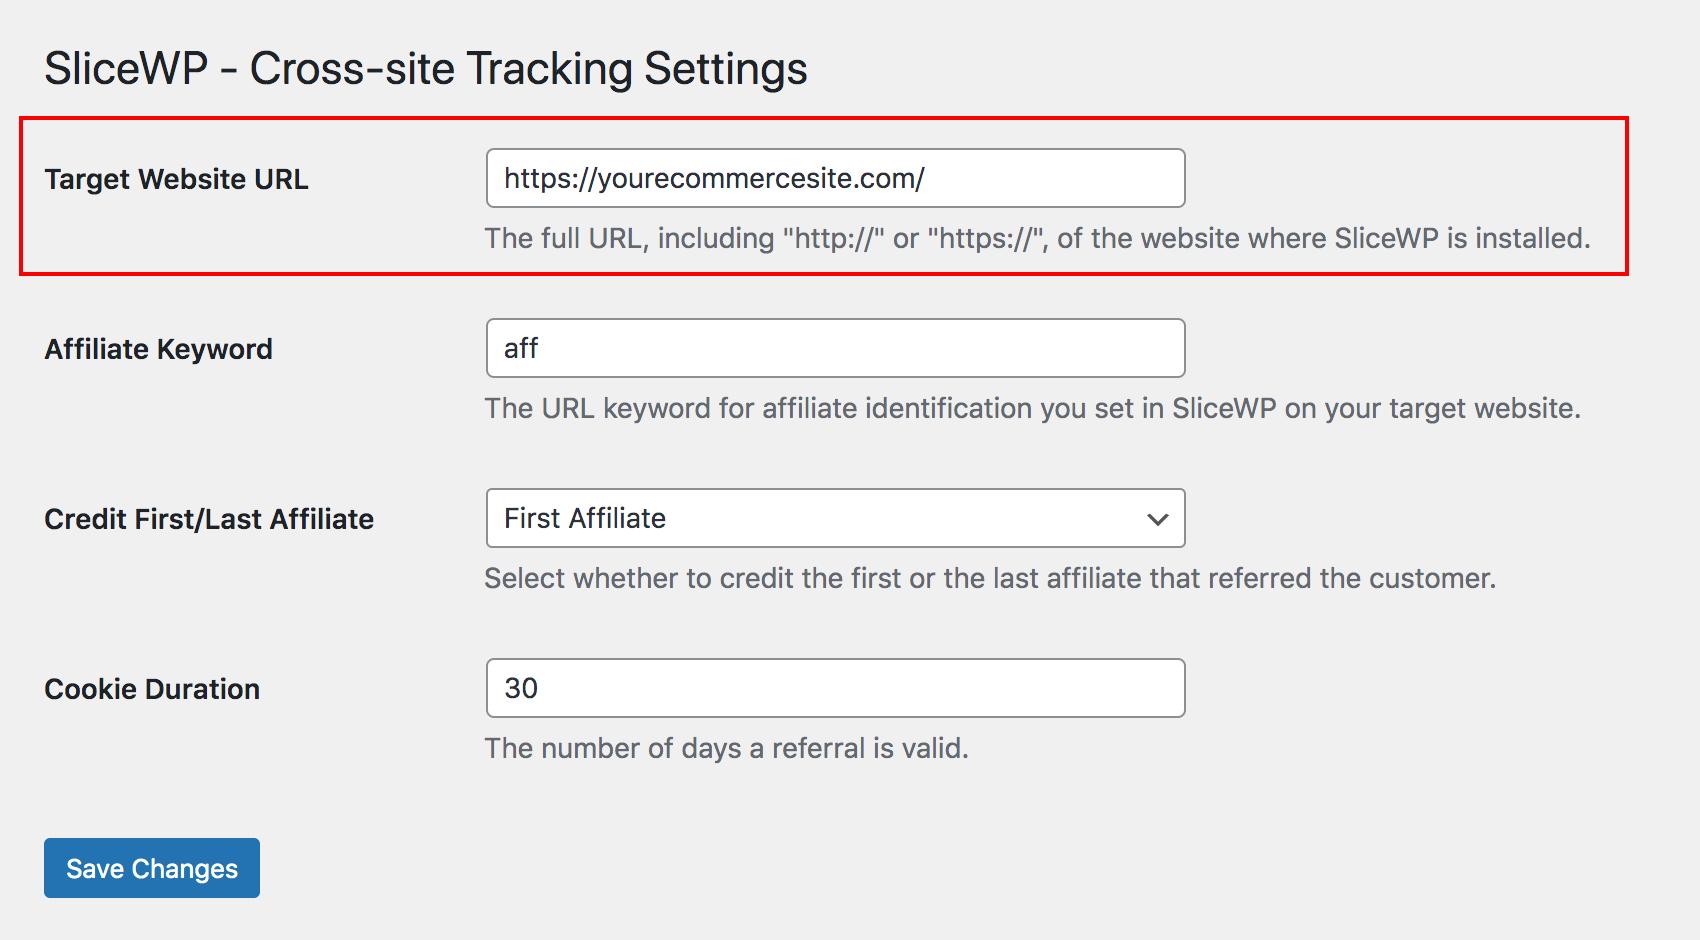 Target website URL option in SliceWP Cross-site Tracking add-on.